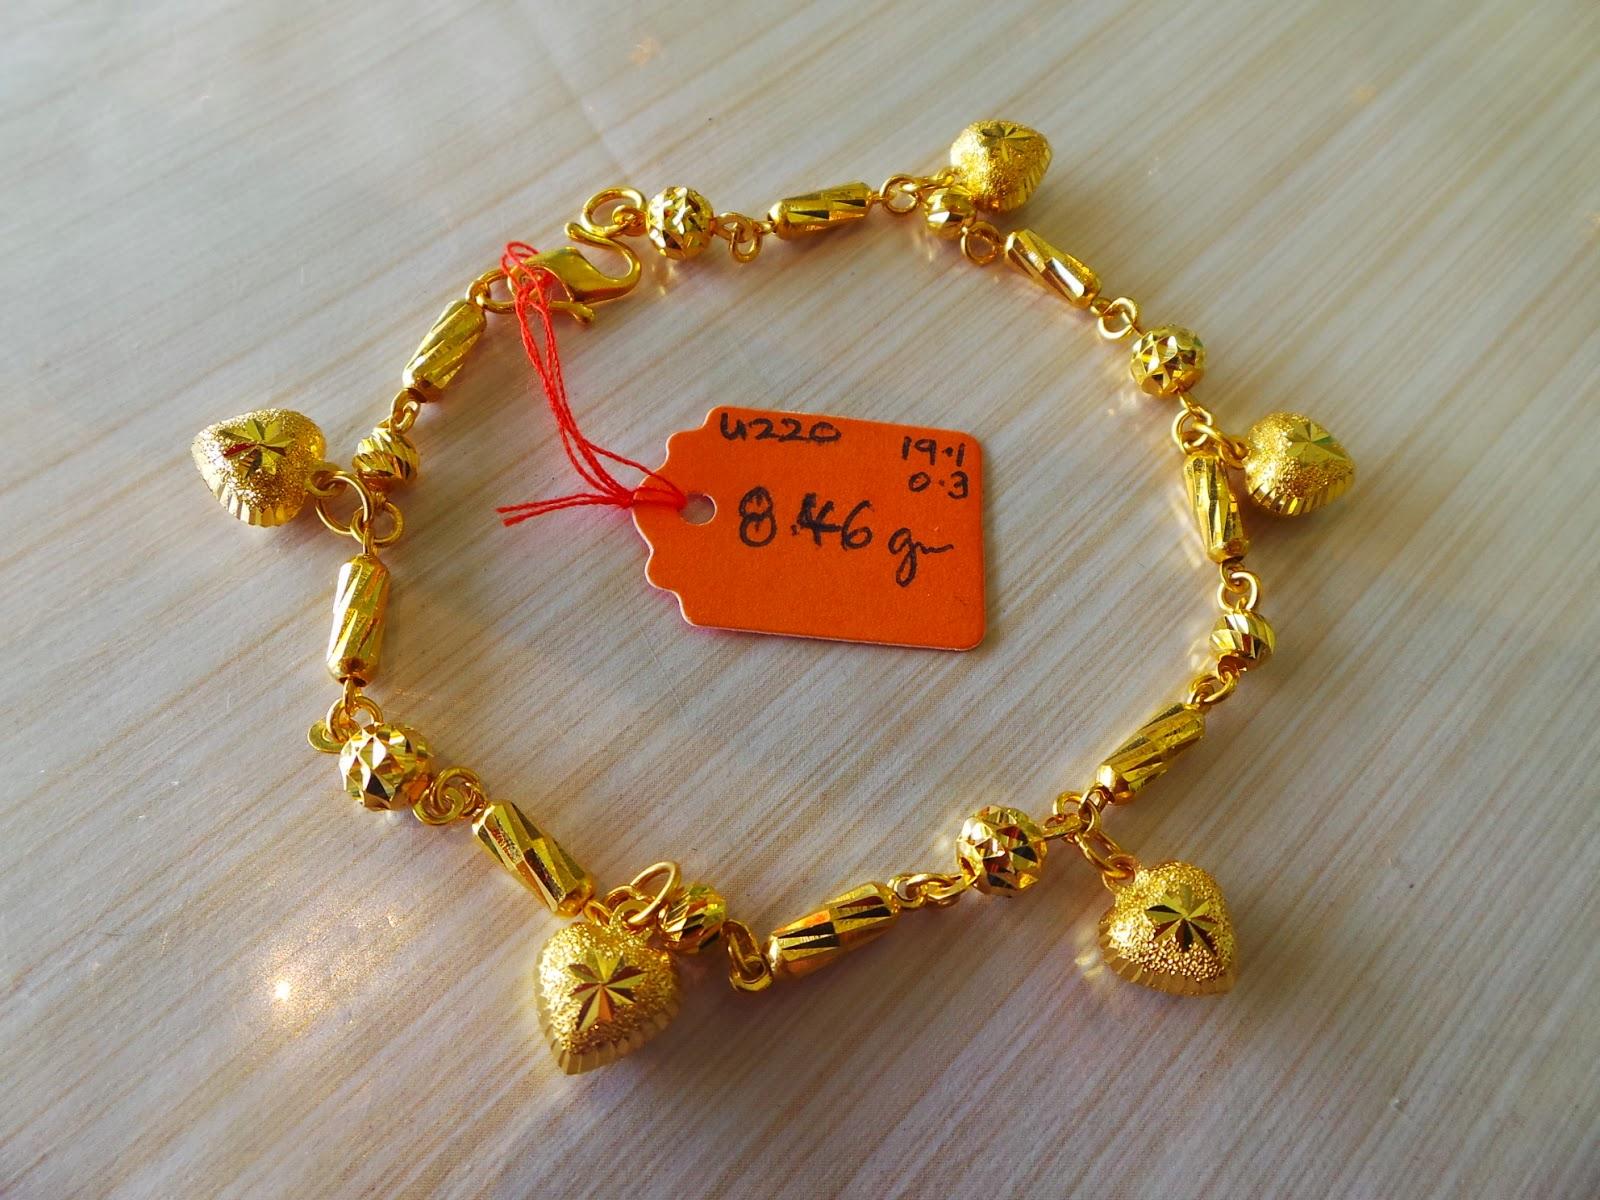 SOLD Rantai Tangan Kayu Berkait Buah Love 846g U220 19